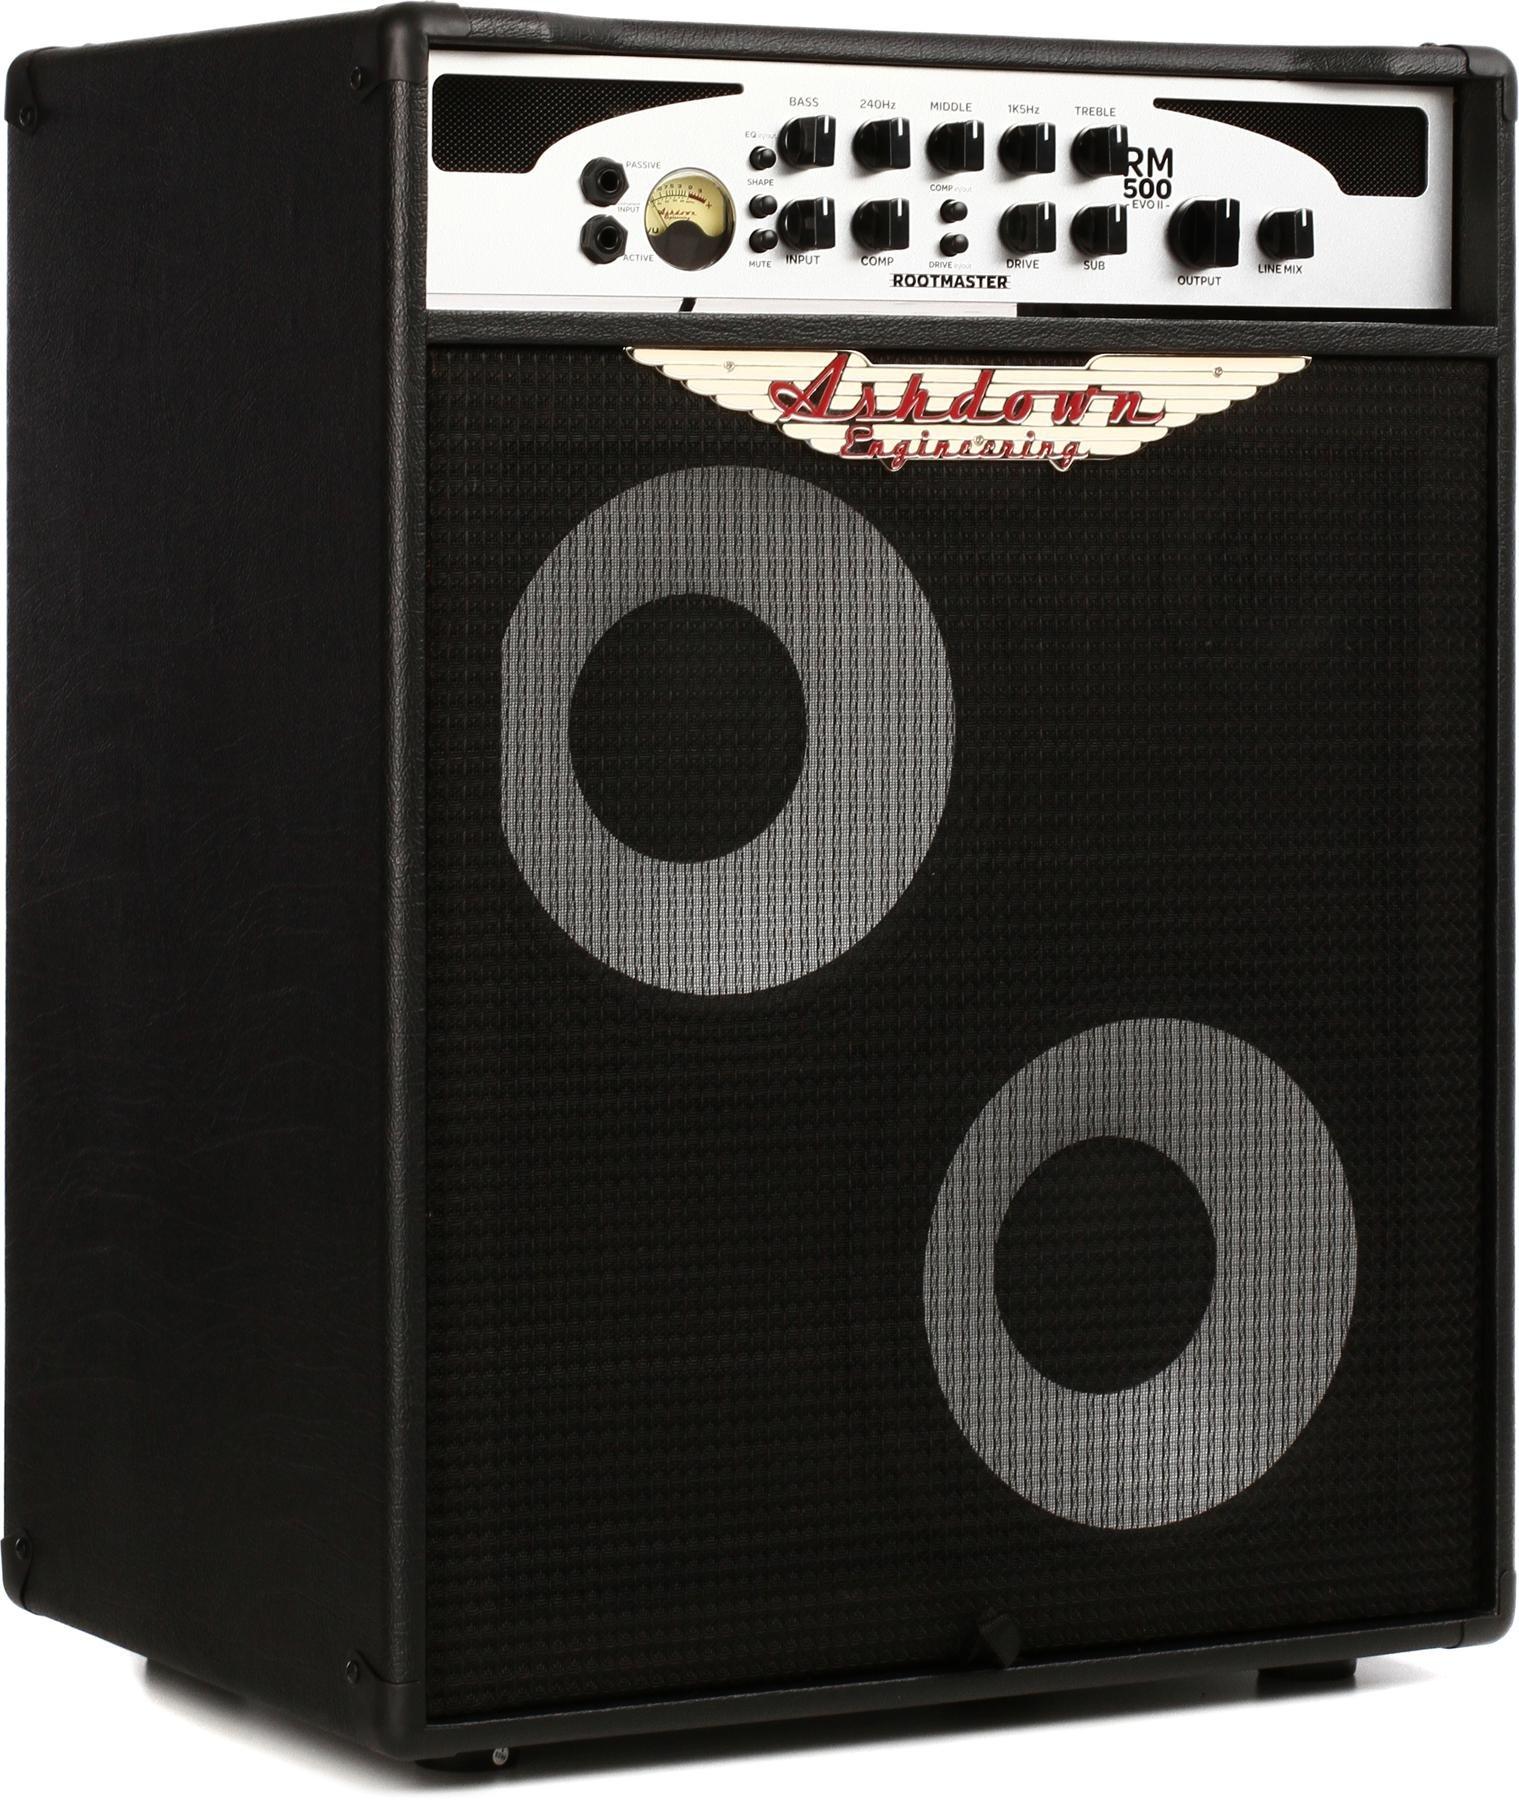 Ashdown Rootmaster Rm500c210 Evo Ii 500w 2x10 Bass Combo Sweetwater 60w Amplifier Image 1